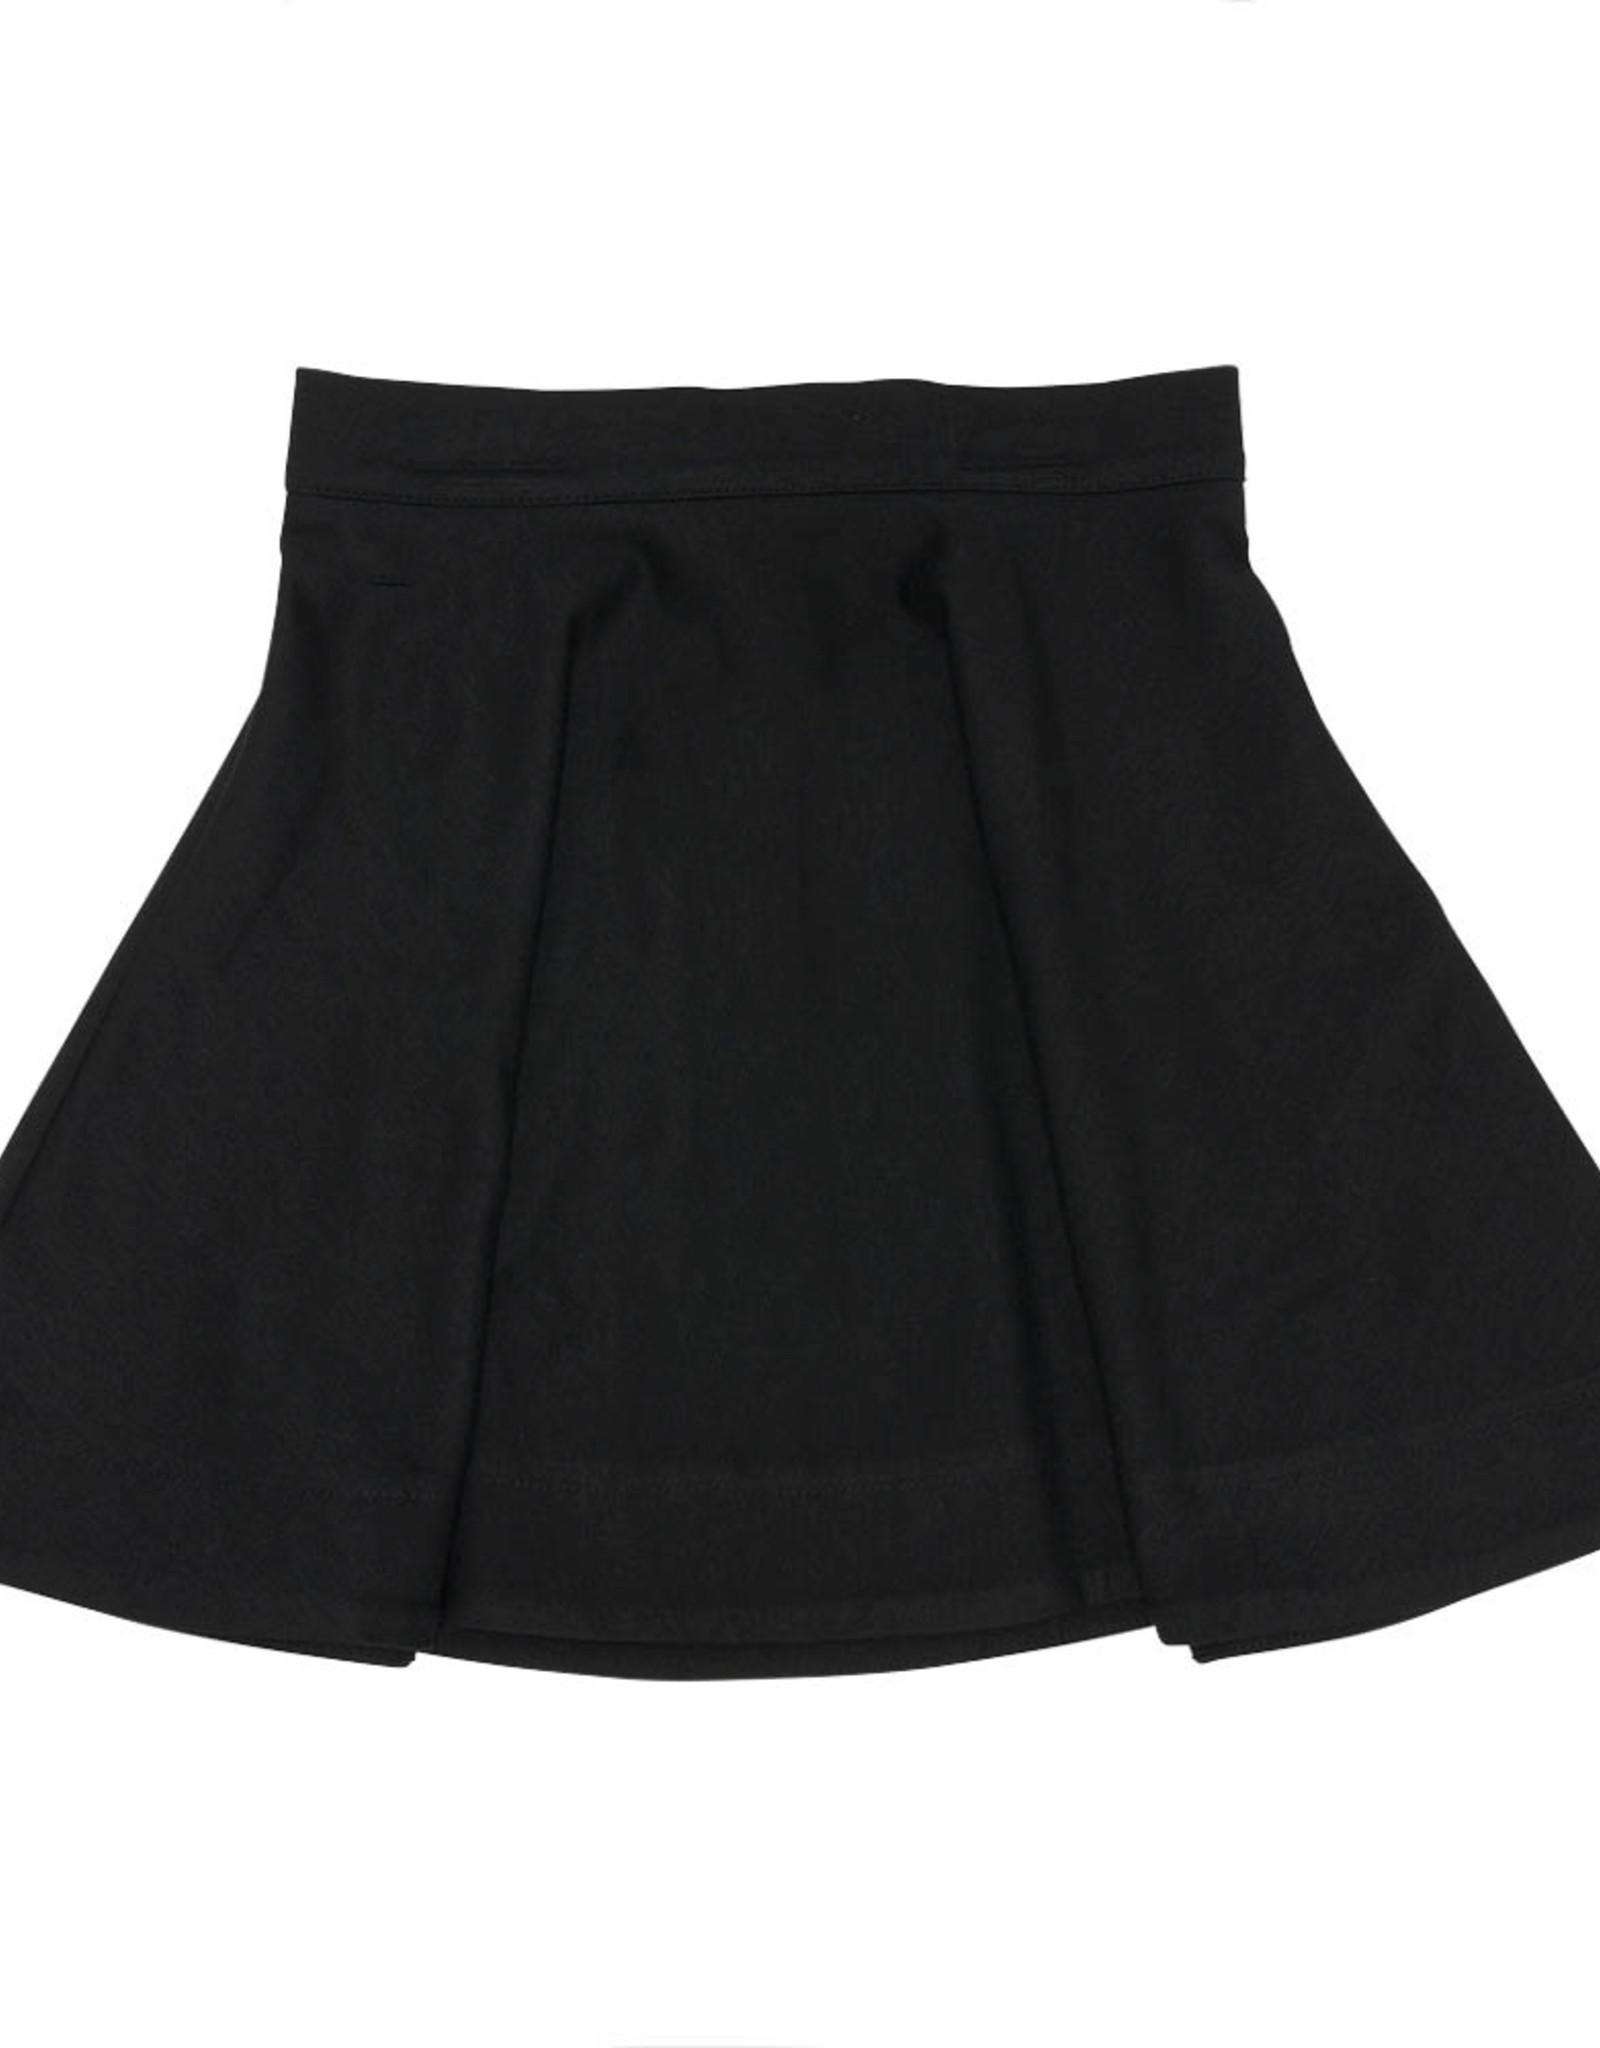 Clo Clo Flare Basic Skirt with Zipper